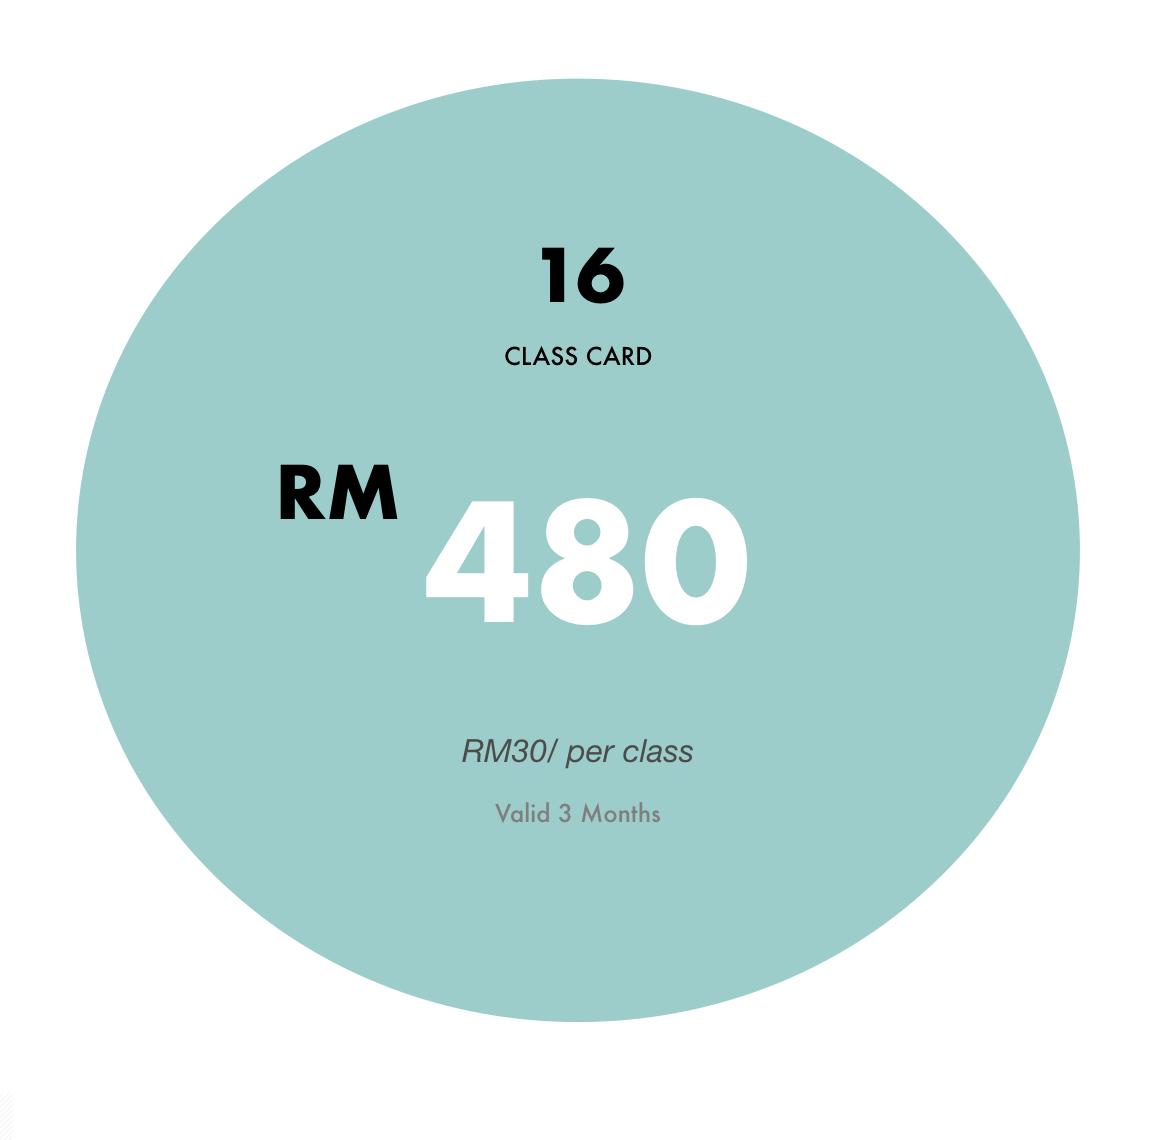 MYR23.75 Per Class